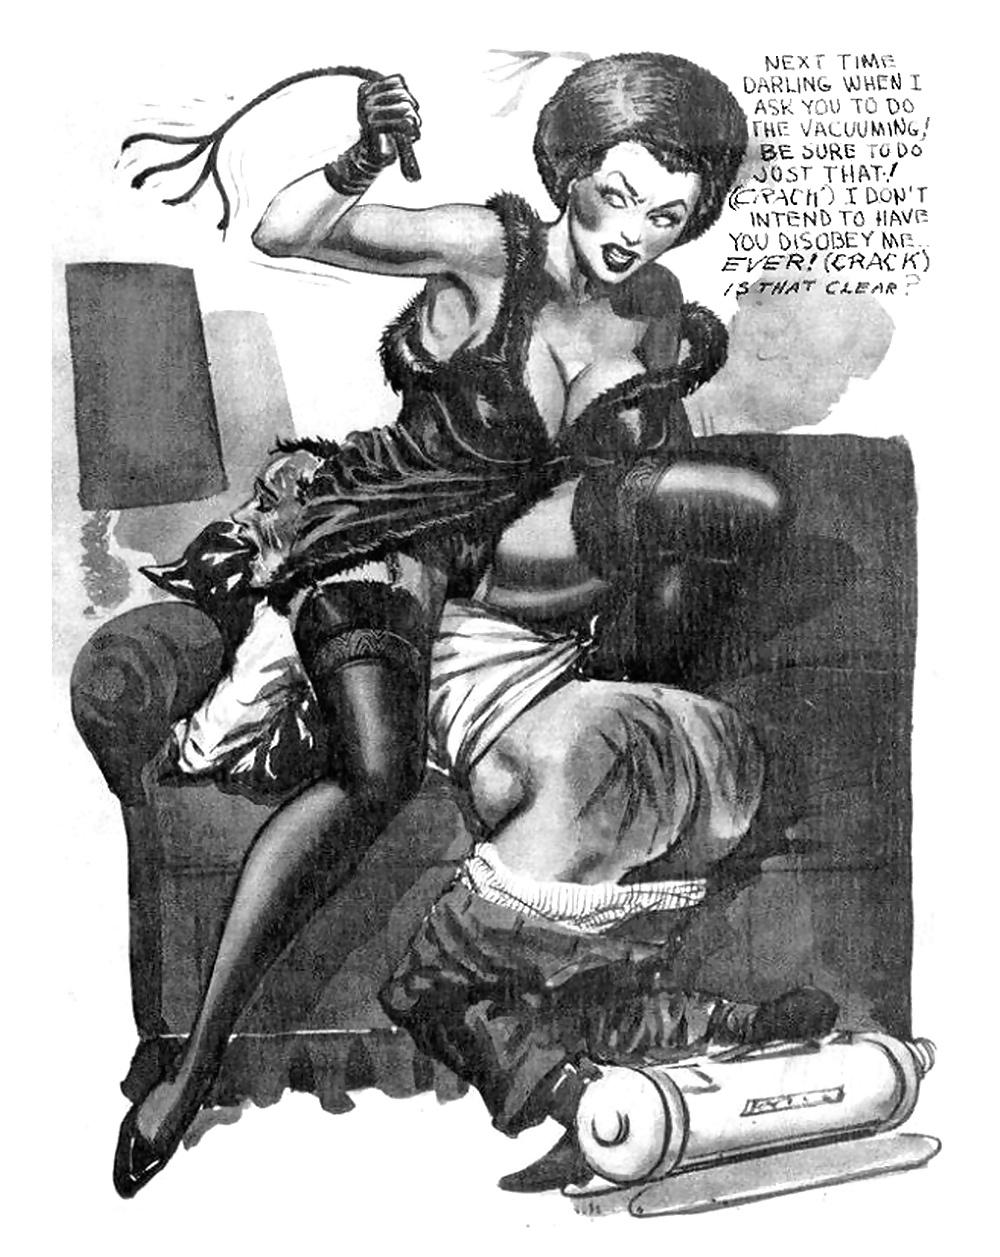 forced-masturbation-art-jepang-kulit-hitam-abg-dientot-dihutan